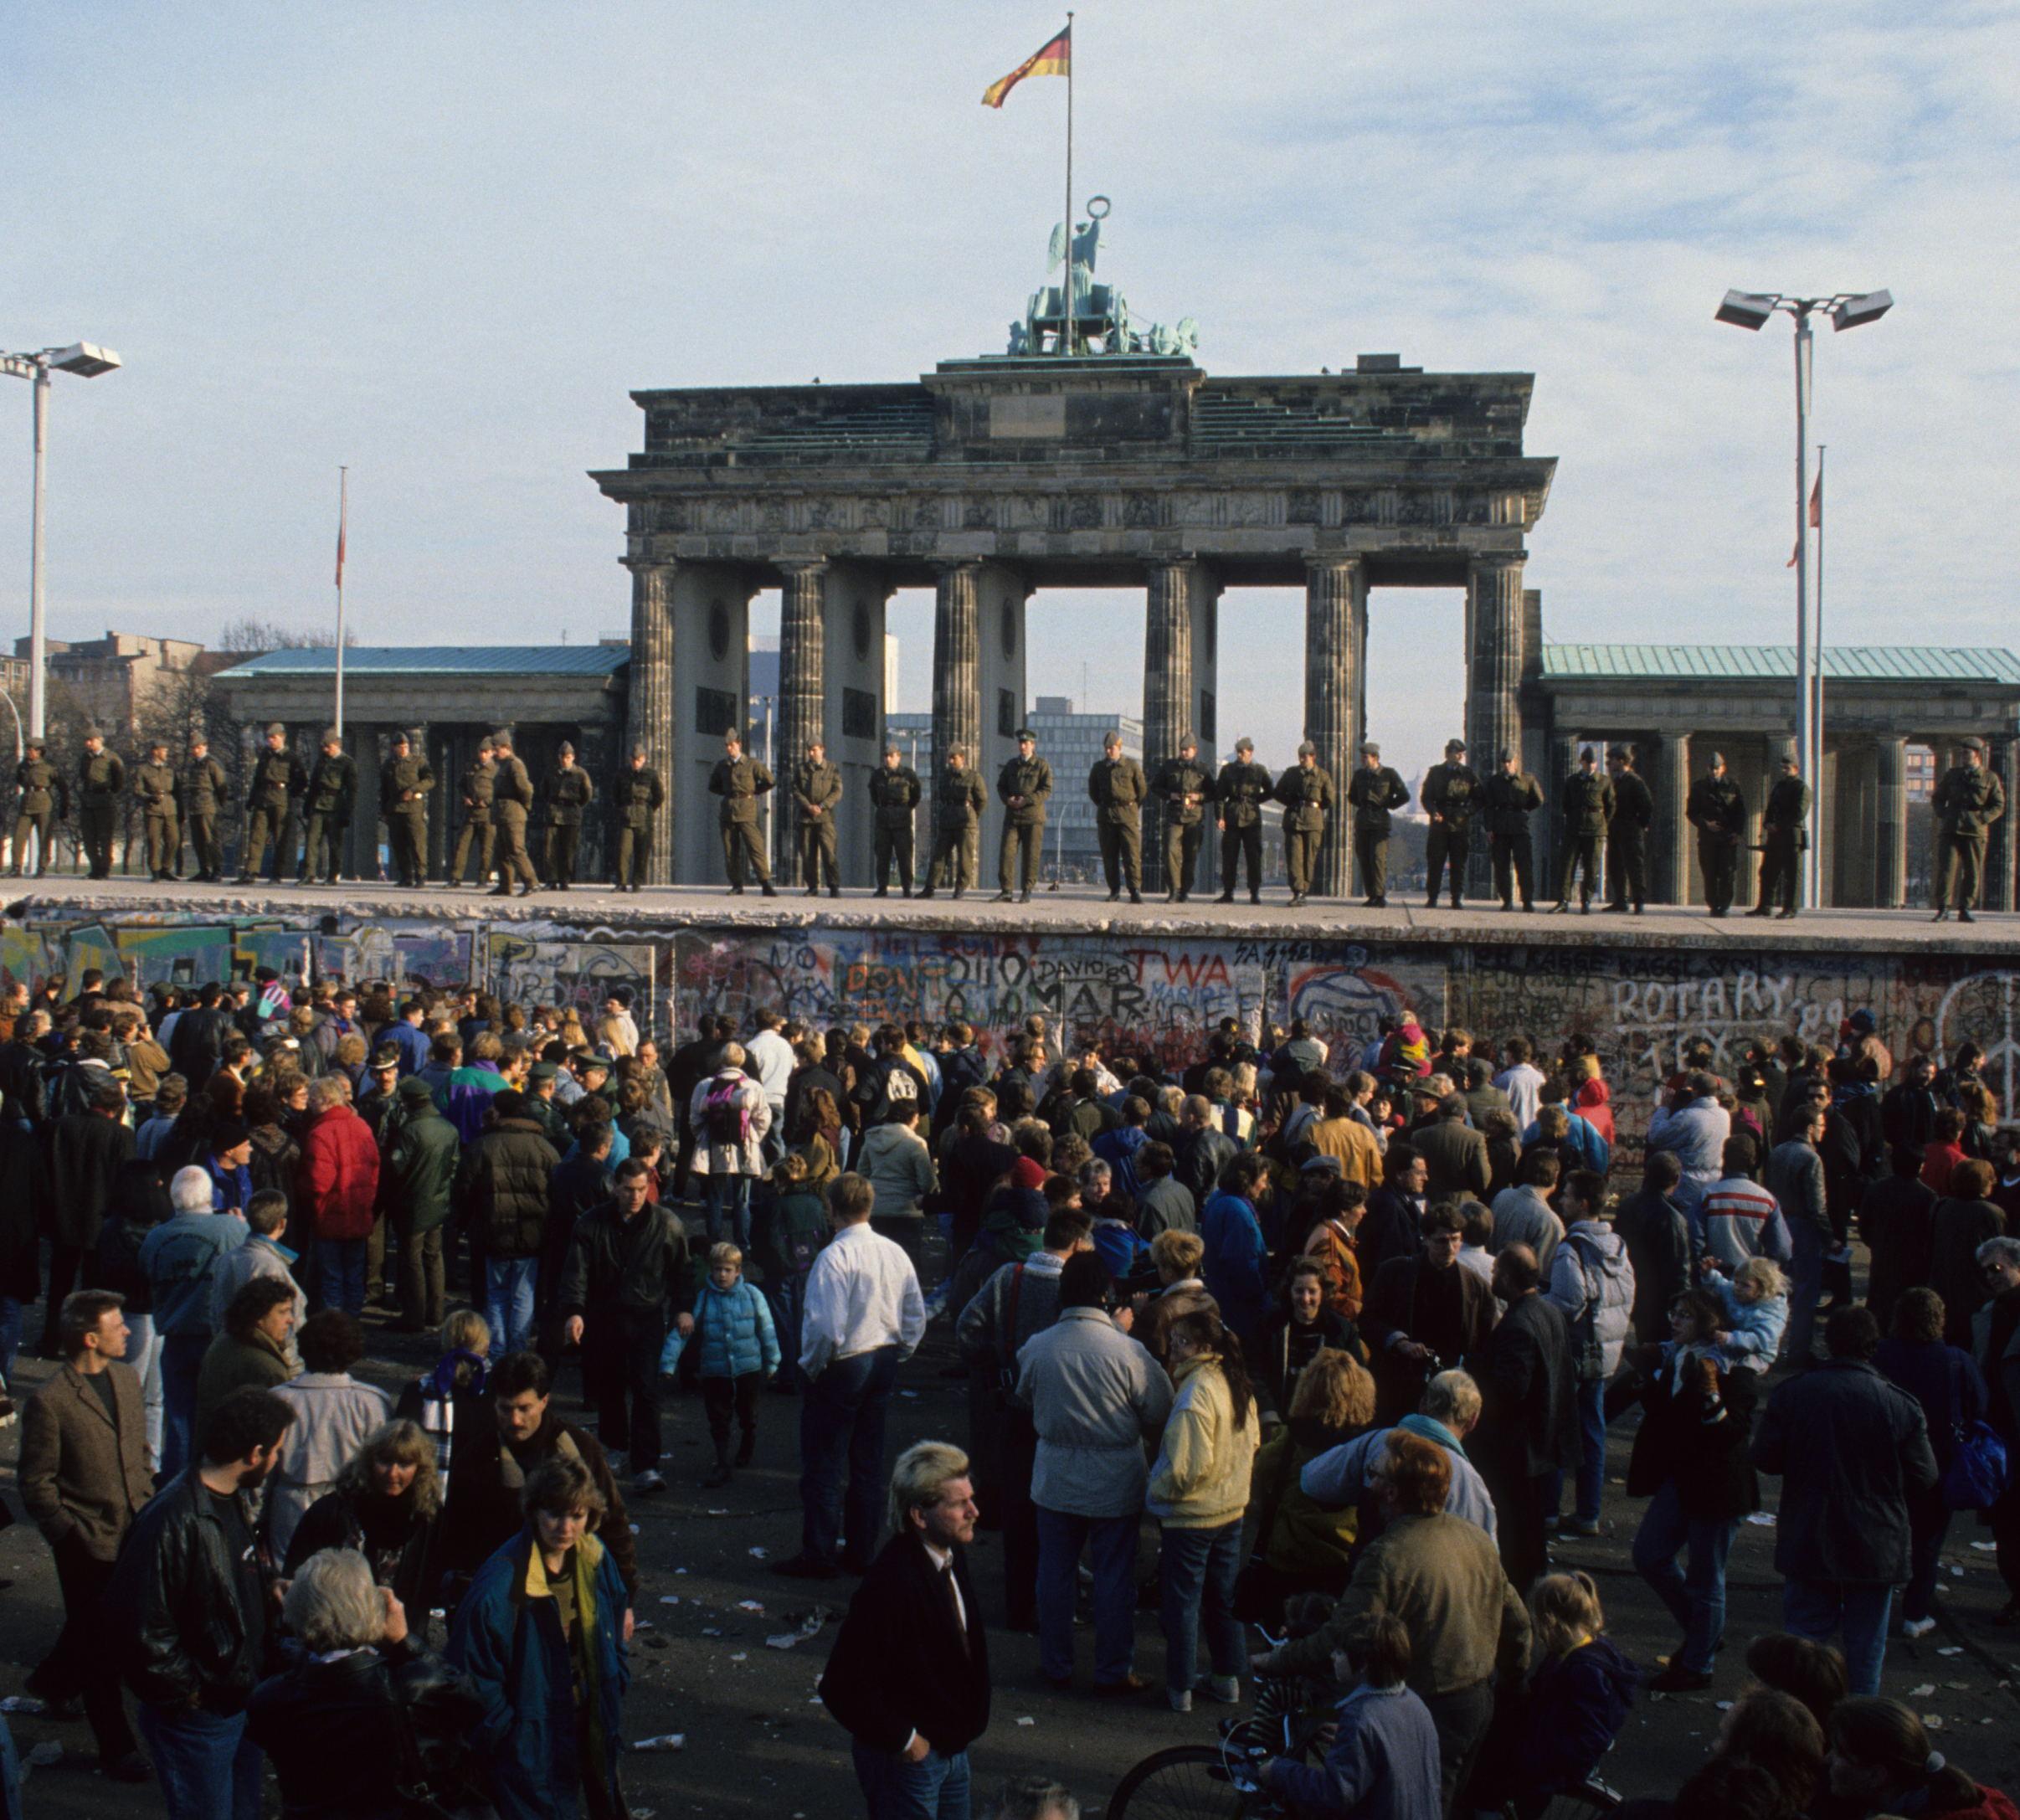 East German soldiers standing atop the Berlin Wall at Brandenburg Gate, November 1989. Photo courtesy of 25 Archiv Bundesstiftung Aufarbeitung – Uwe Gerig. (www.berlin.de/2013).